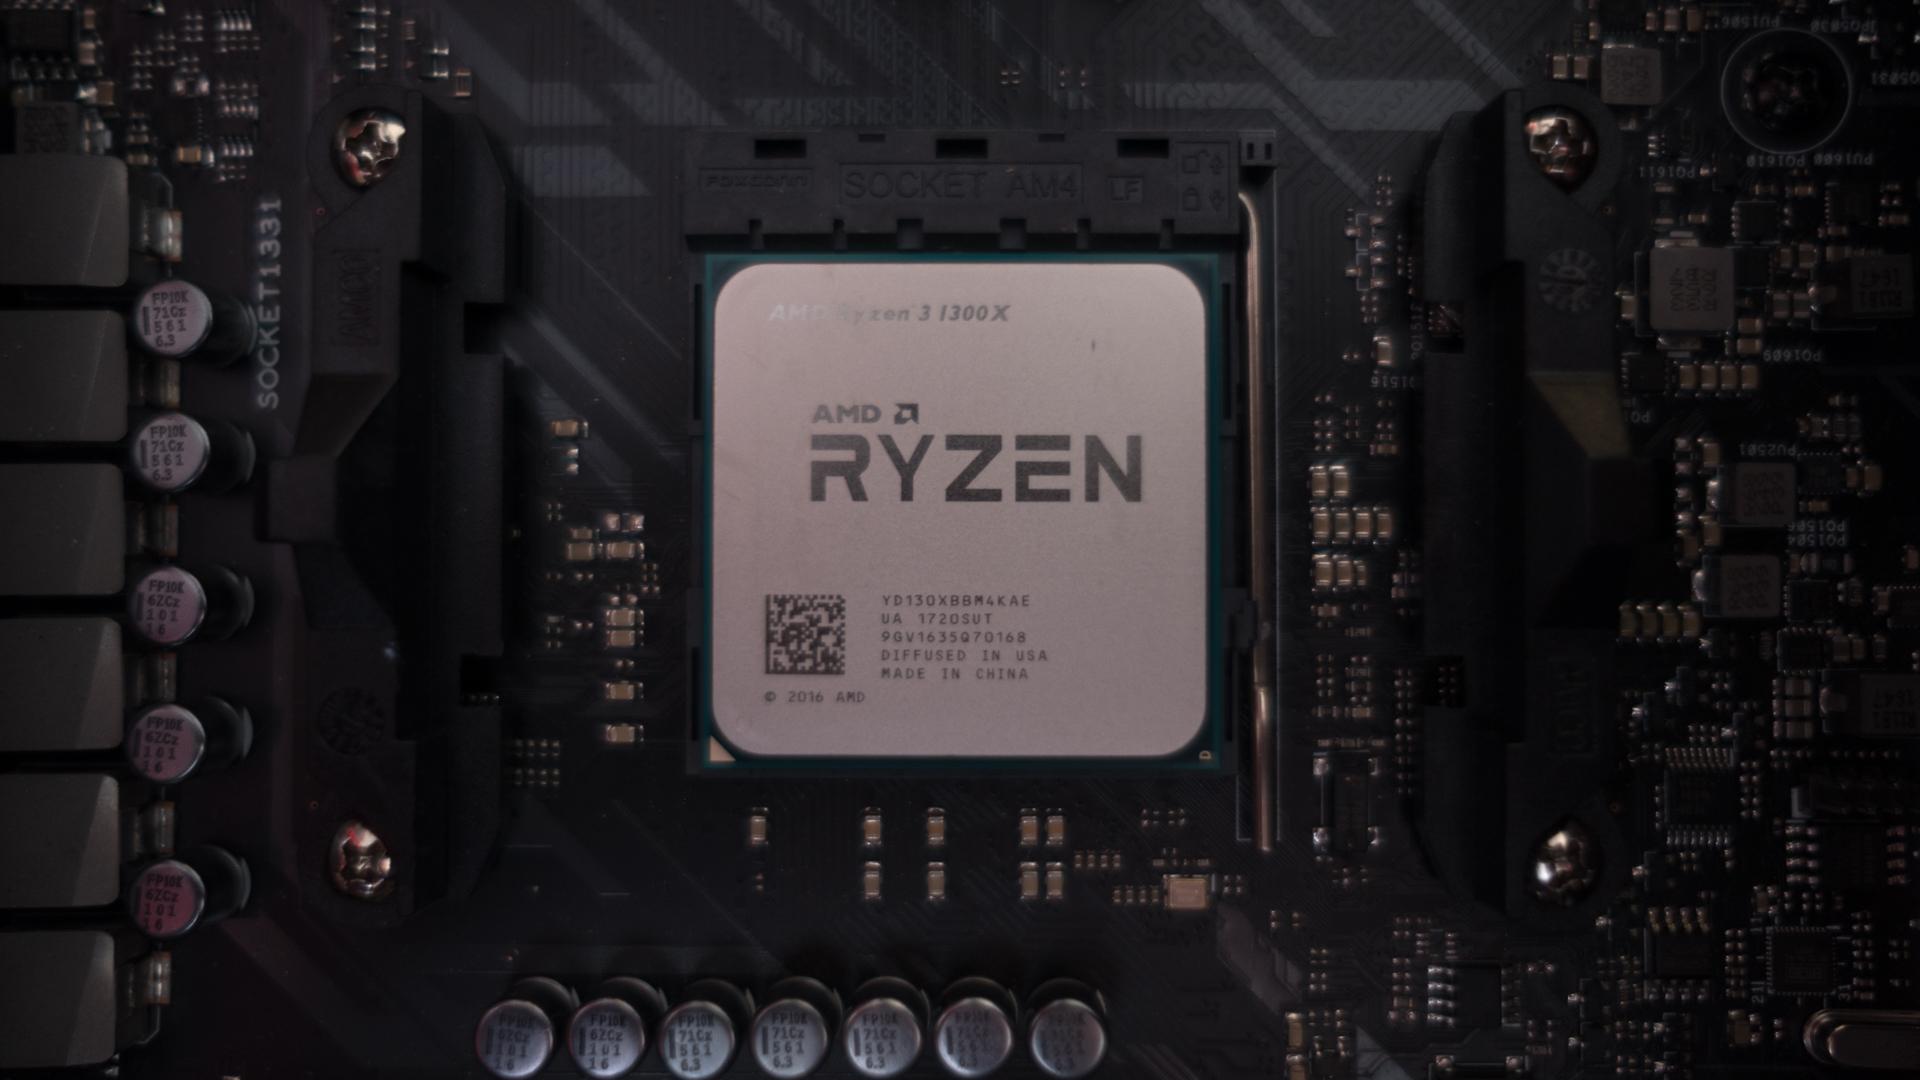 AMD Ryzen 3 1300X review | TechRadar